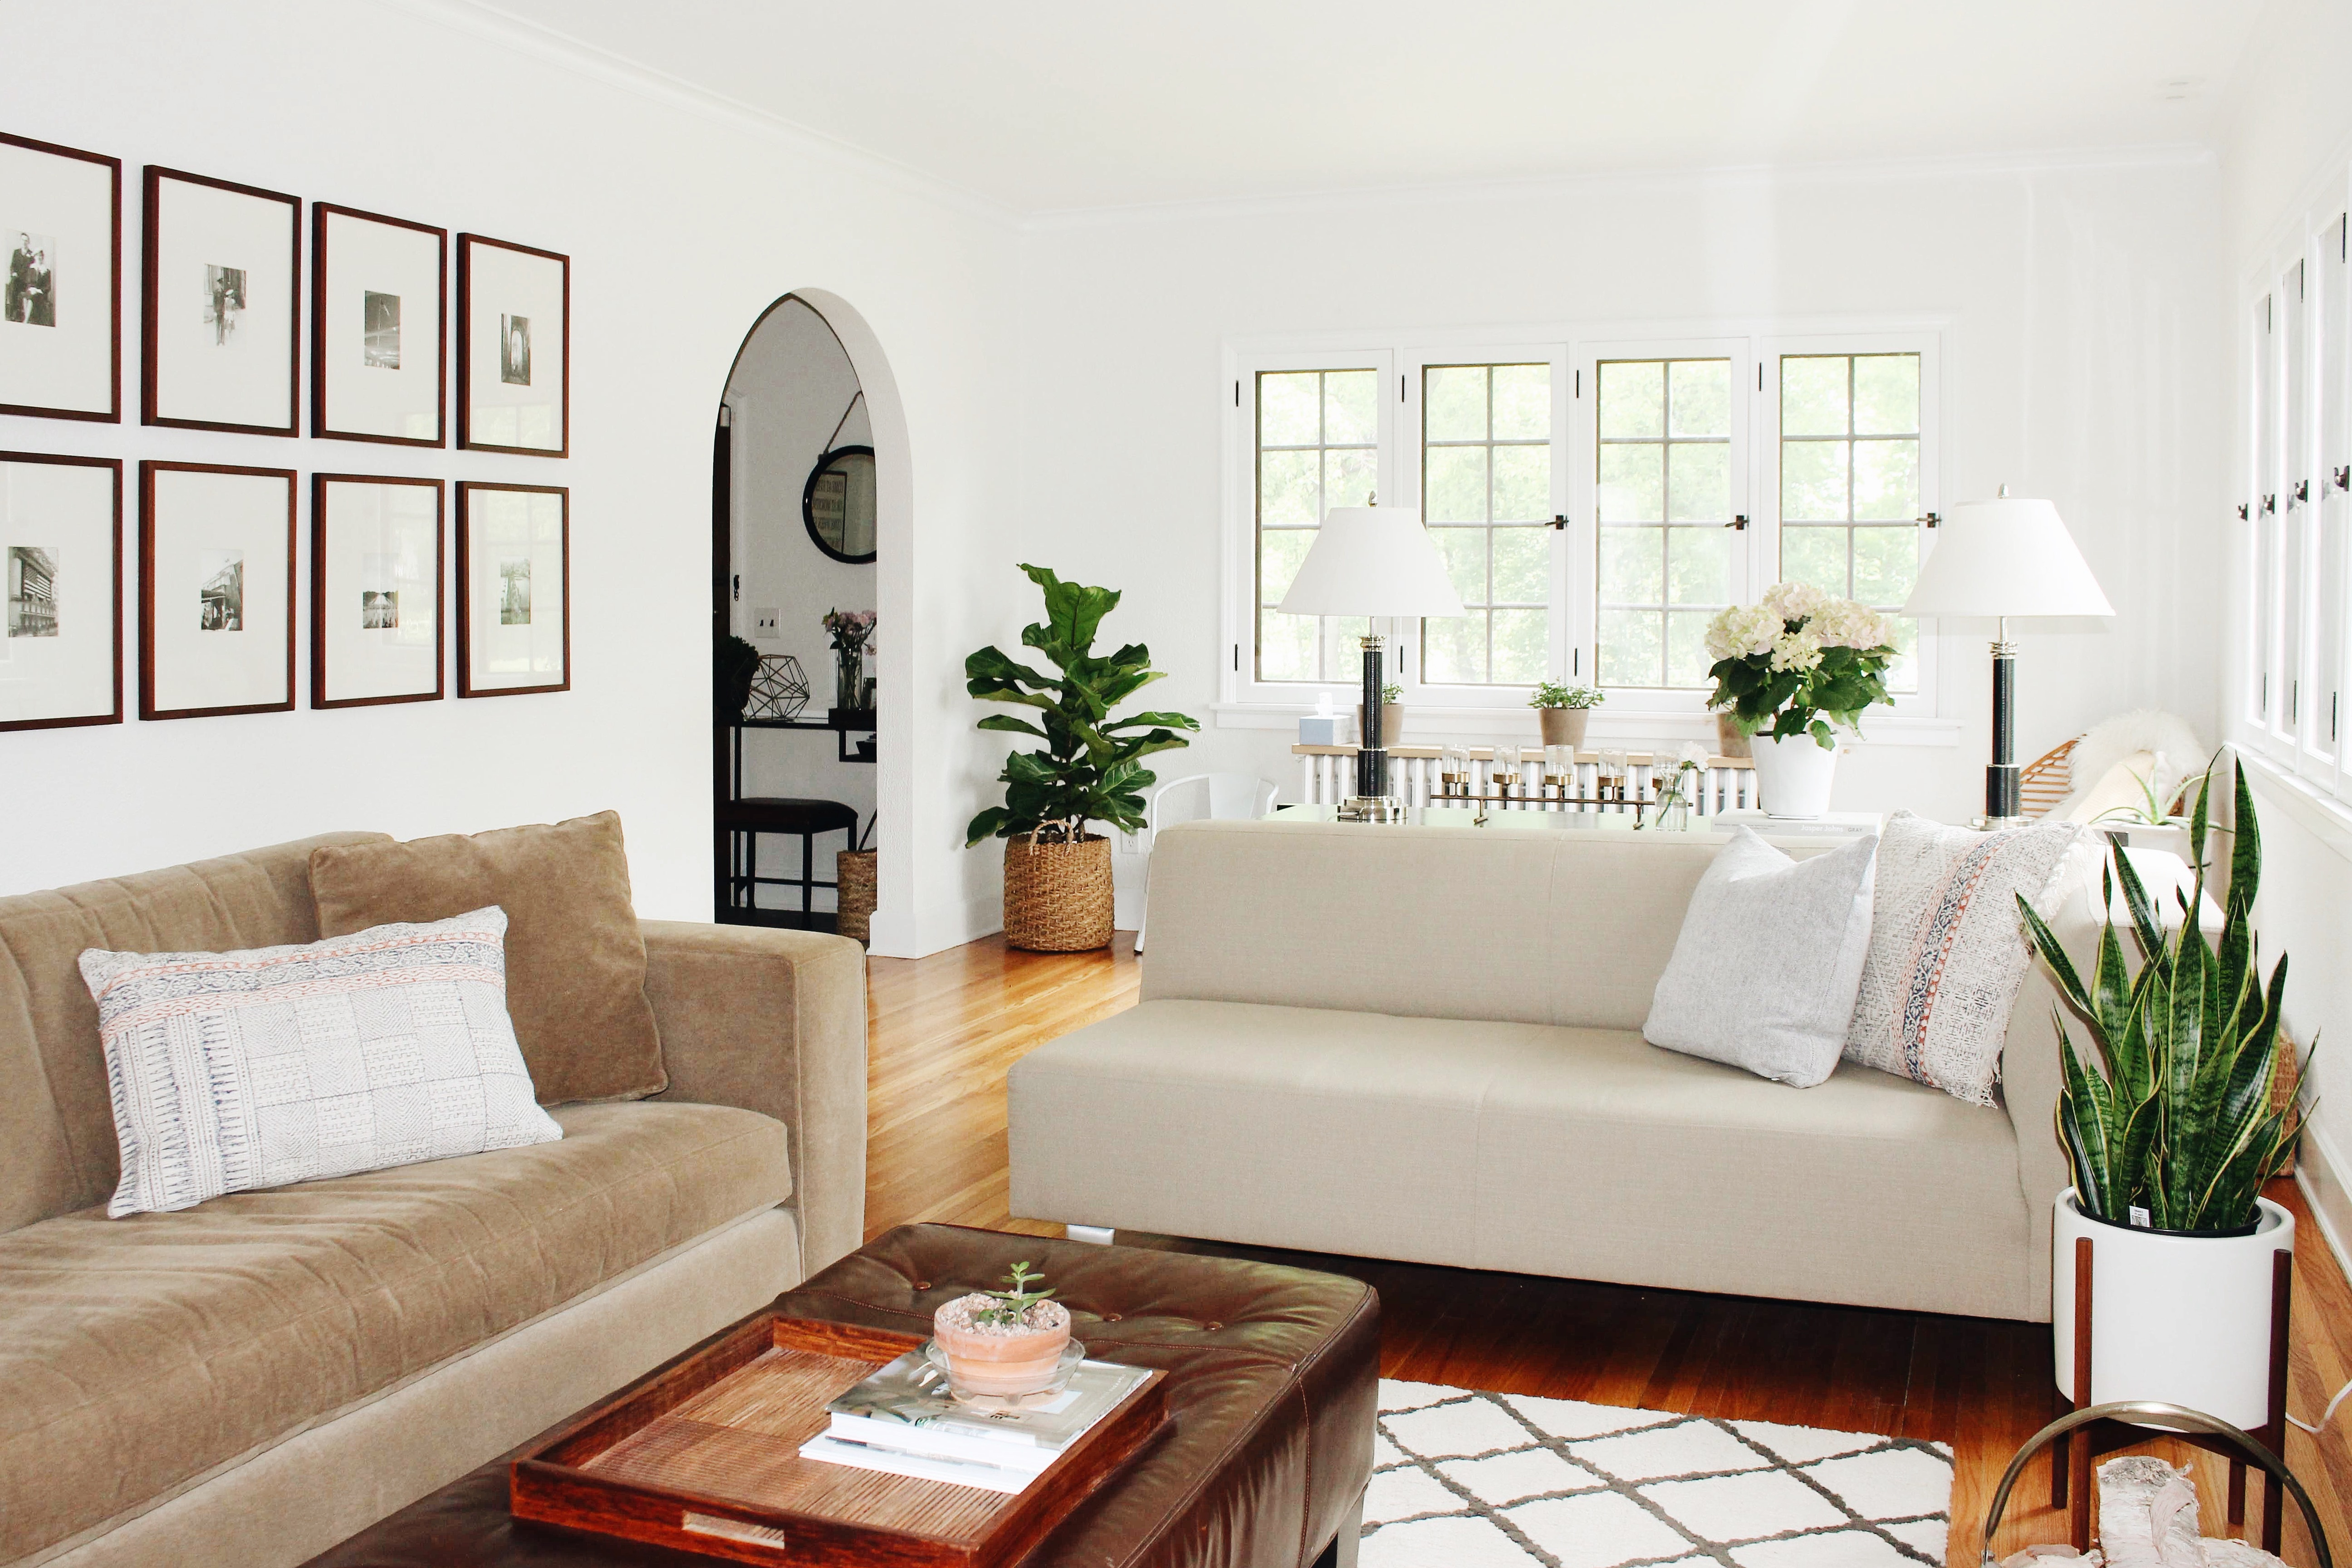 Patti-wagner_living-room.jpeg?mtime=20181031134922#asset:423930